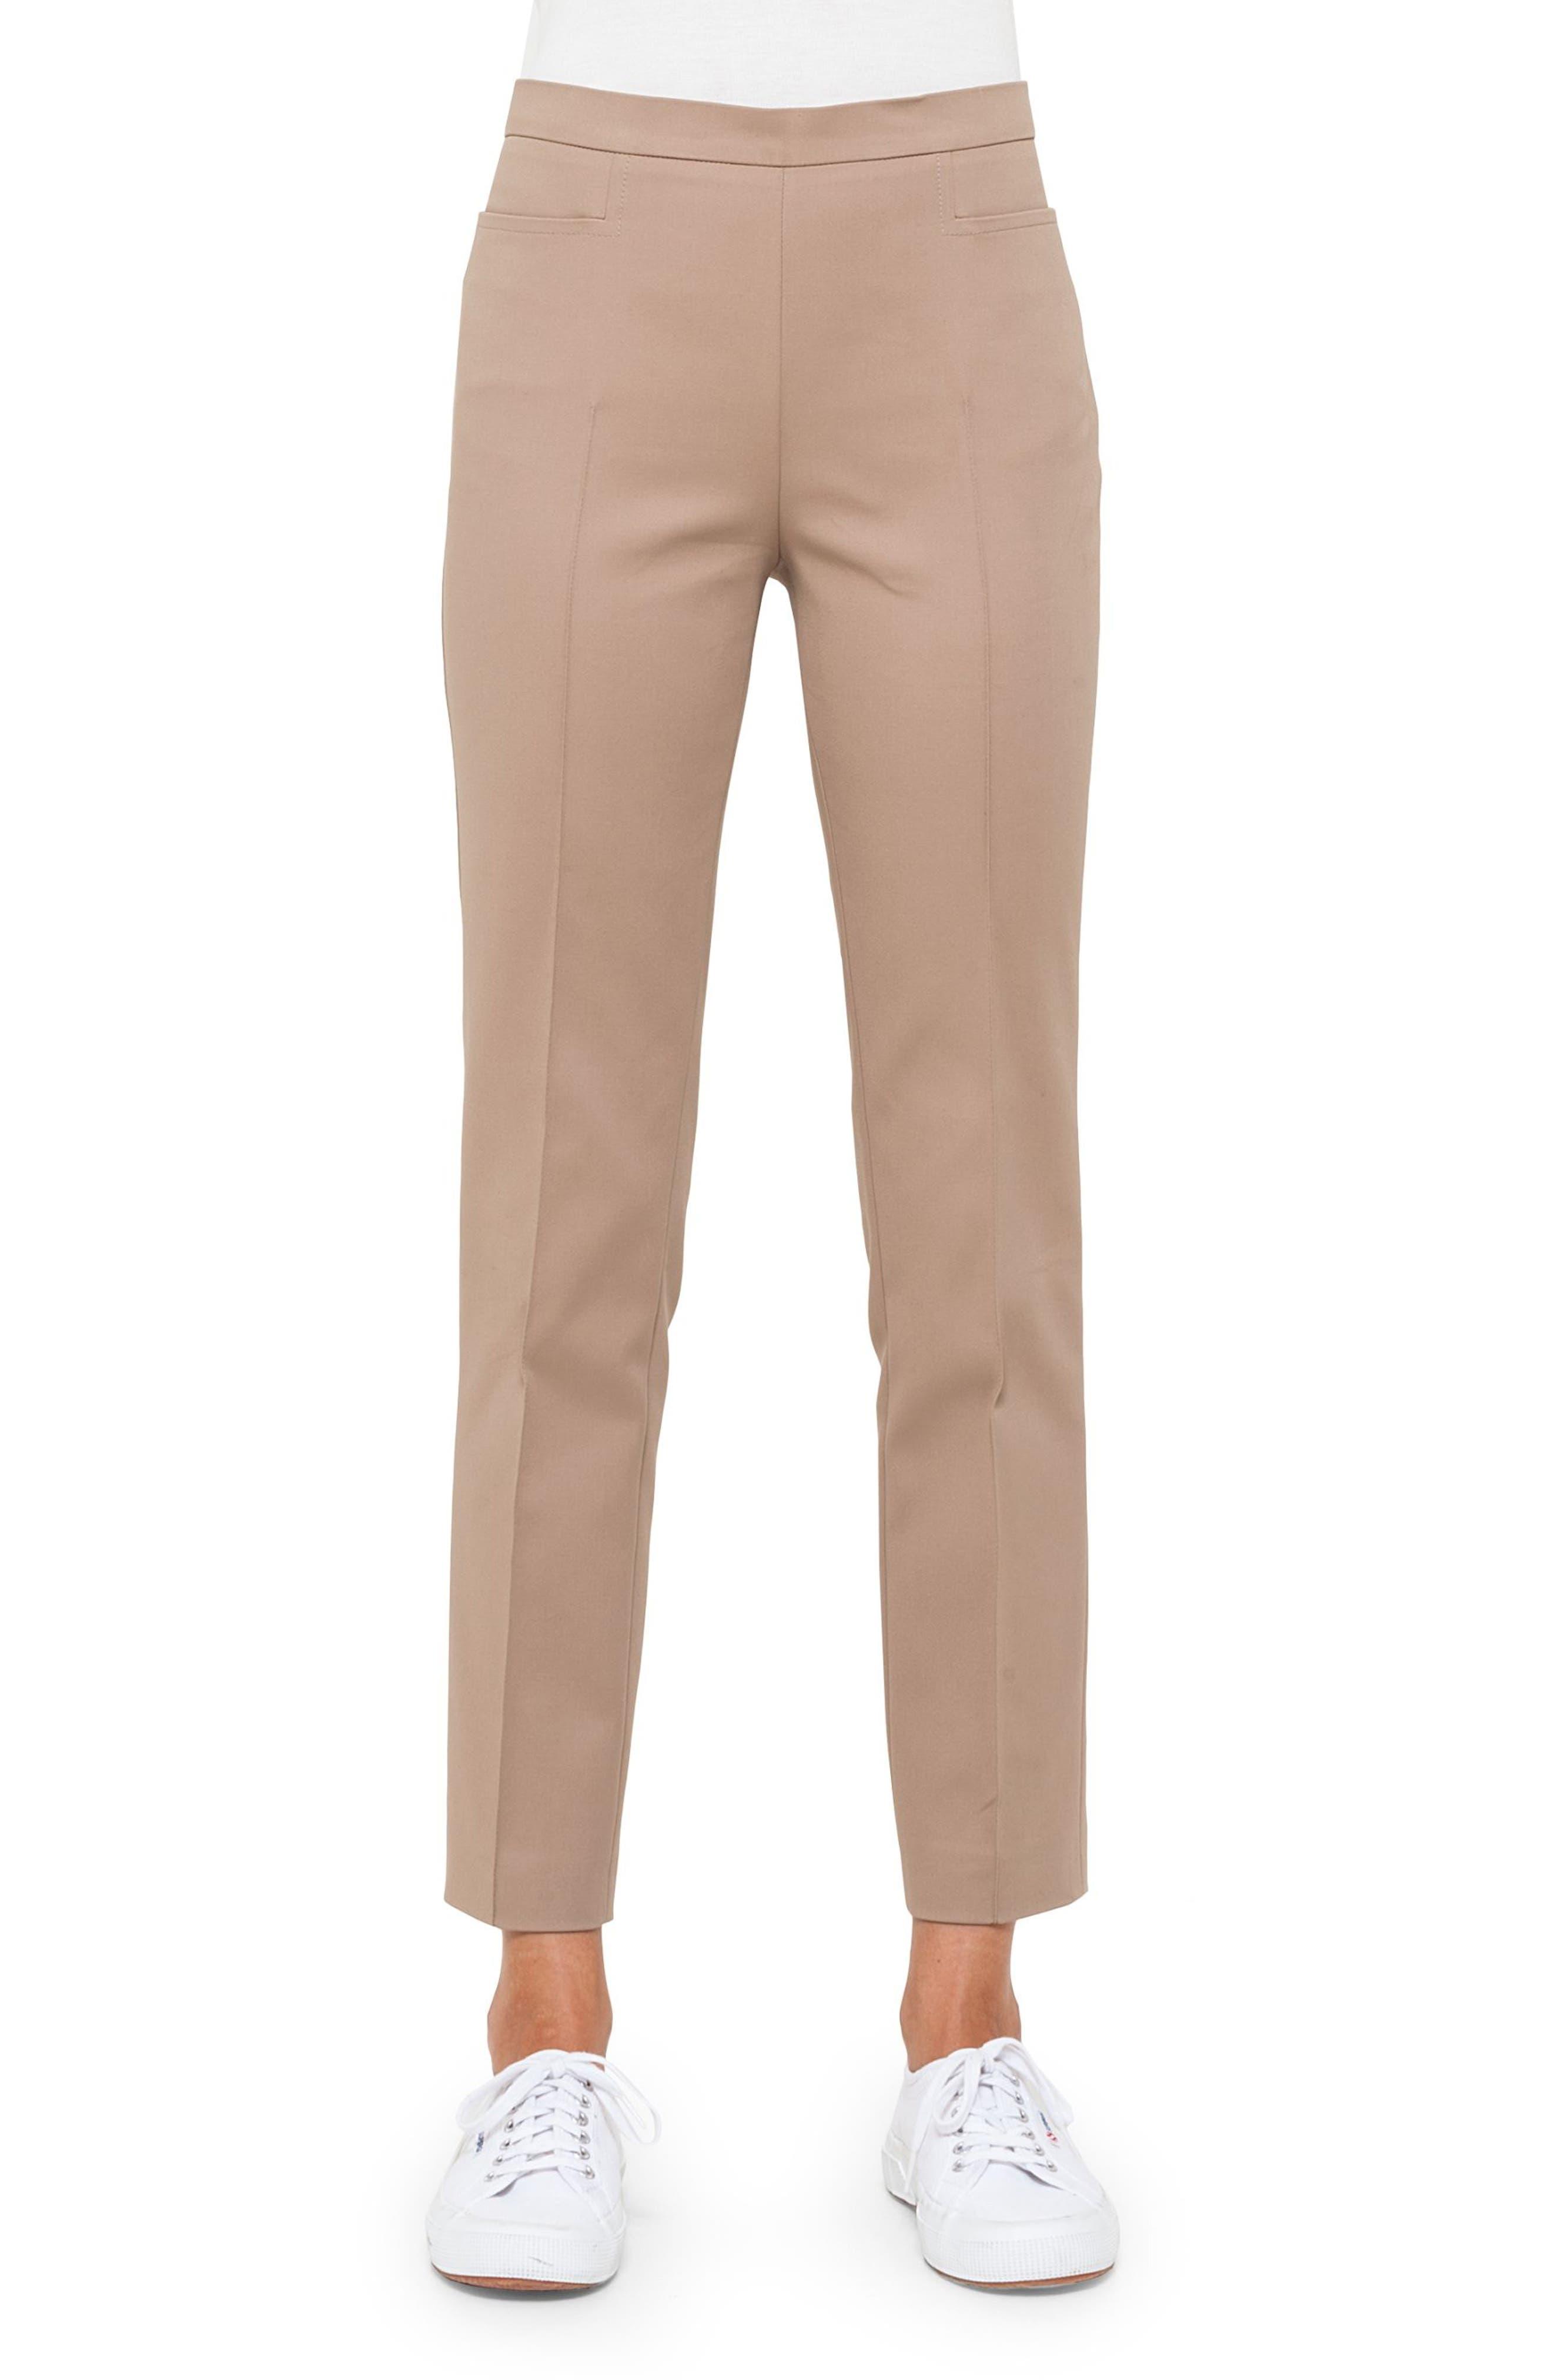 'Franca' Techno Cotton Pants,                             Main thumbnail 1, color,                             133